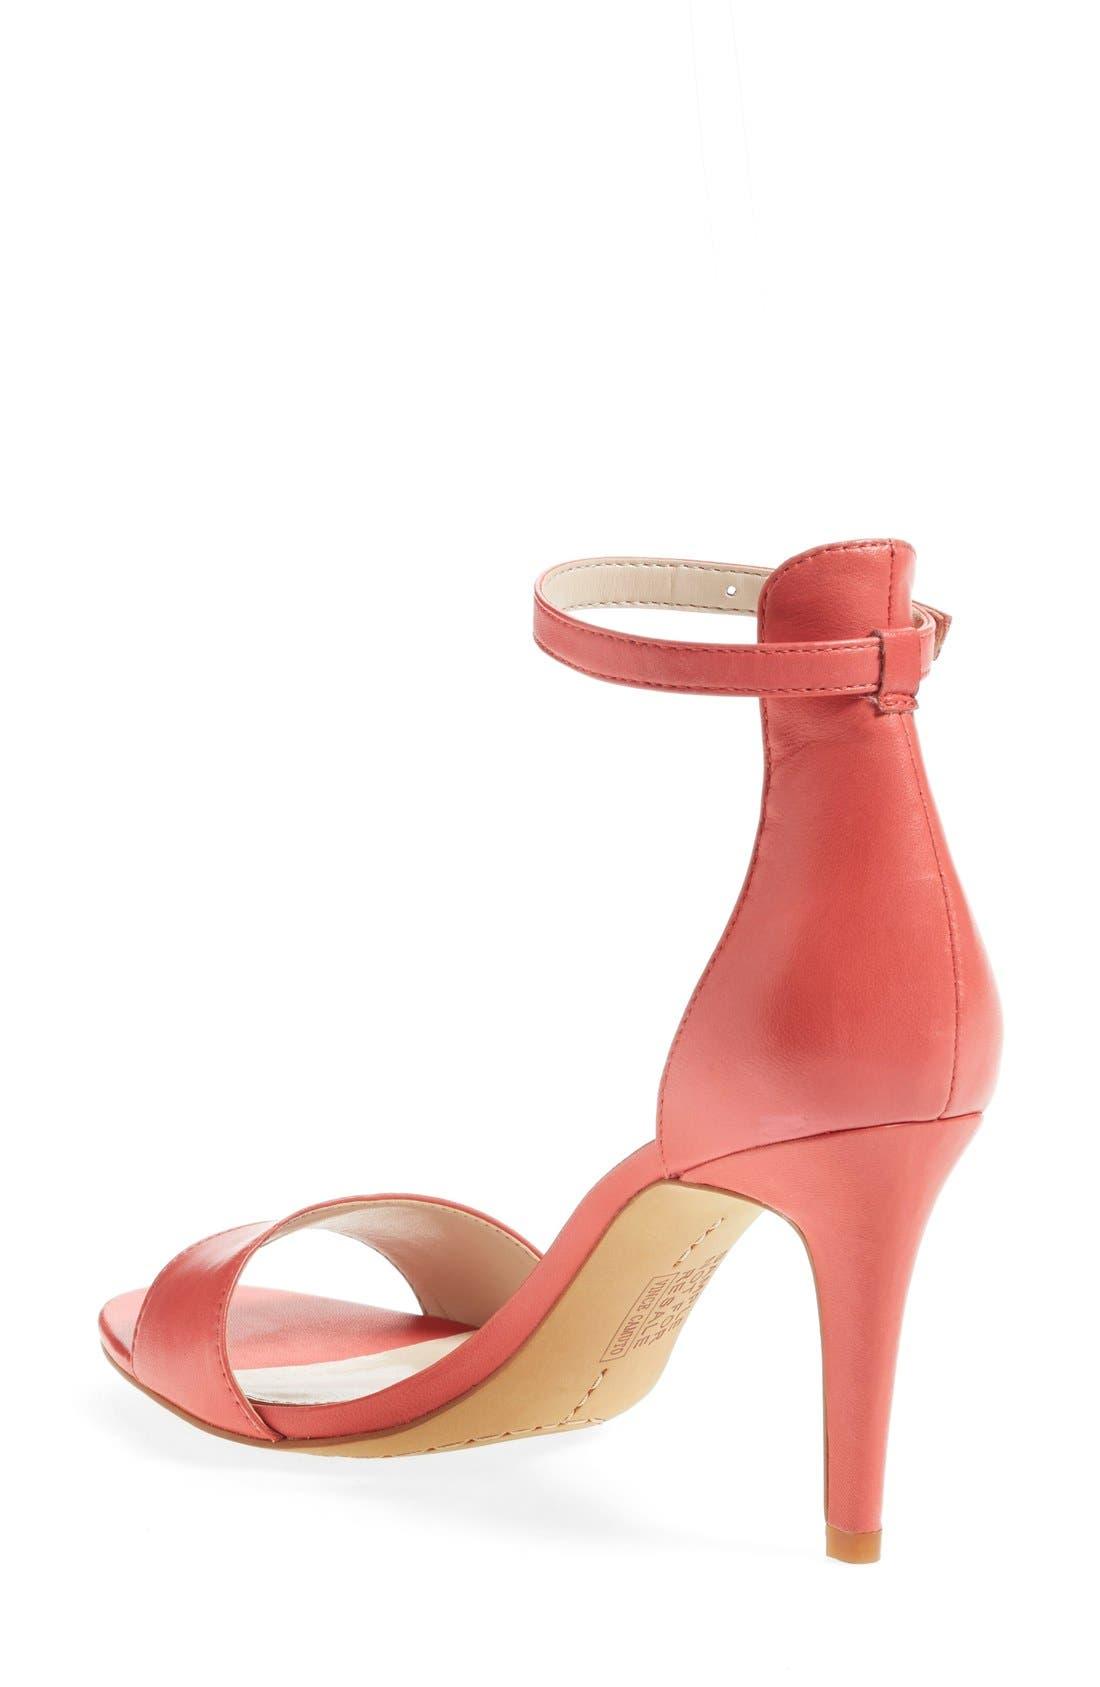 ,                             'Court' Ankle Strap Sandal,                             Alternate thumbnail 94, color,                             660